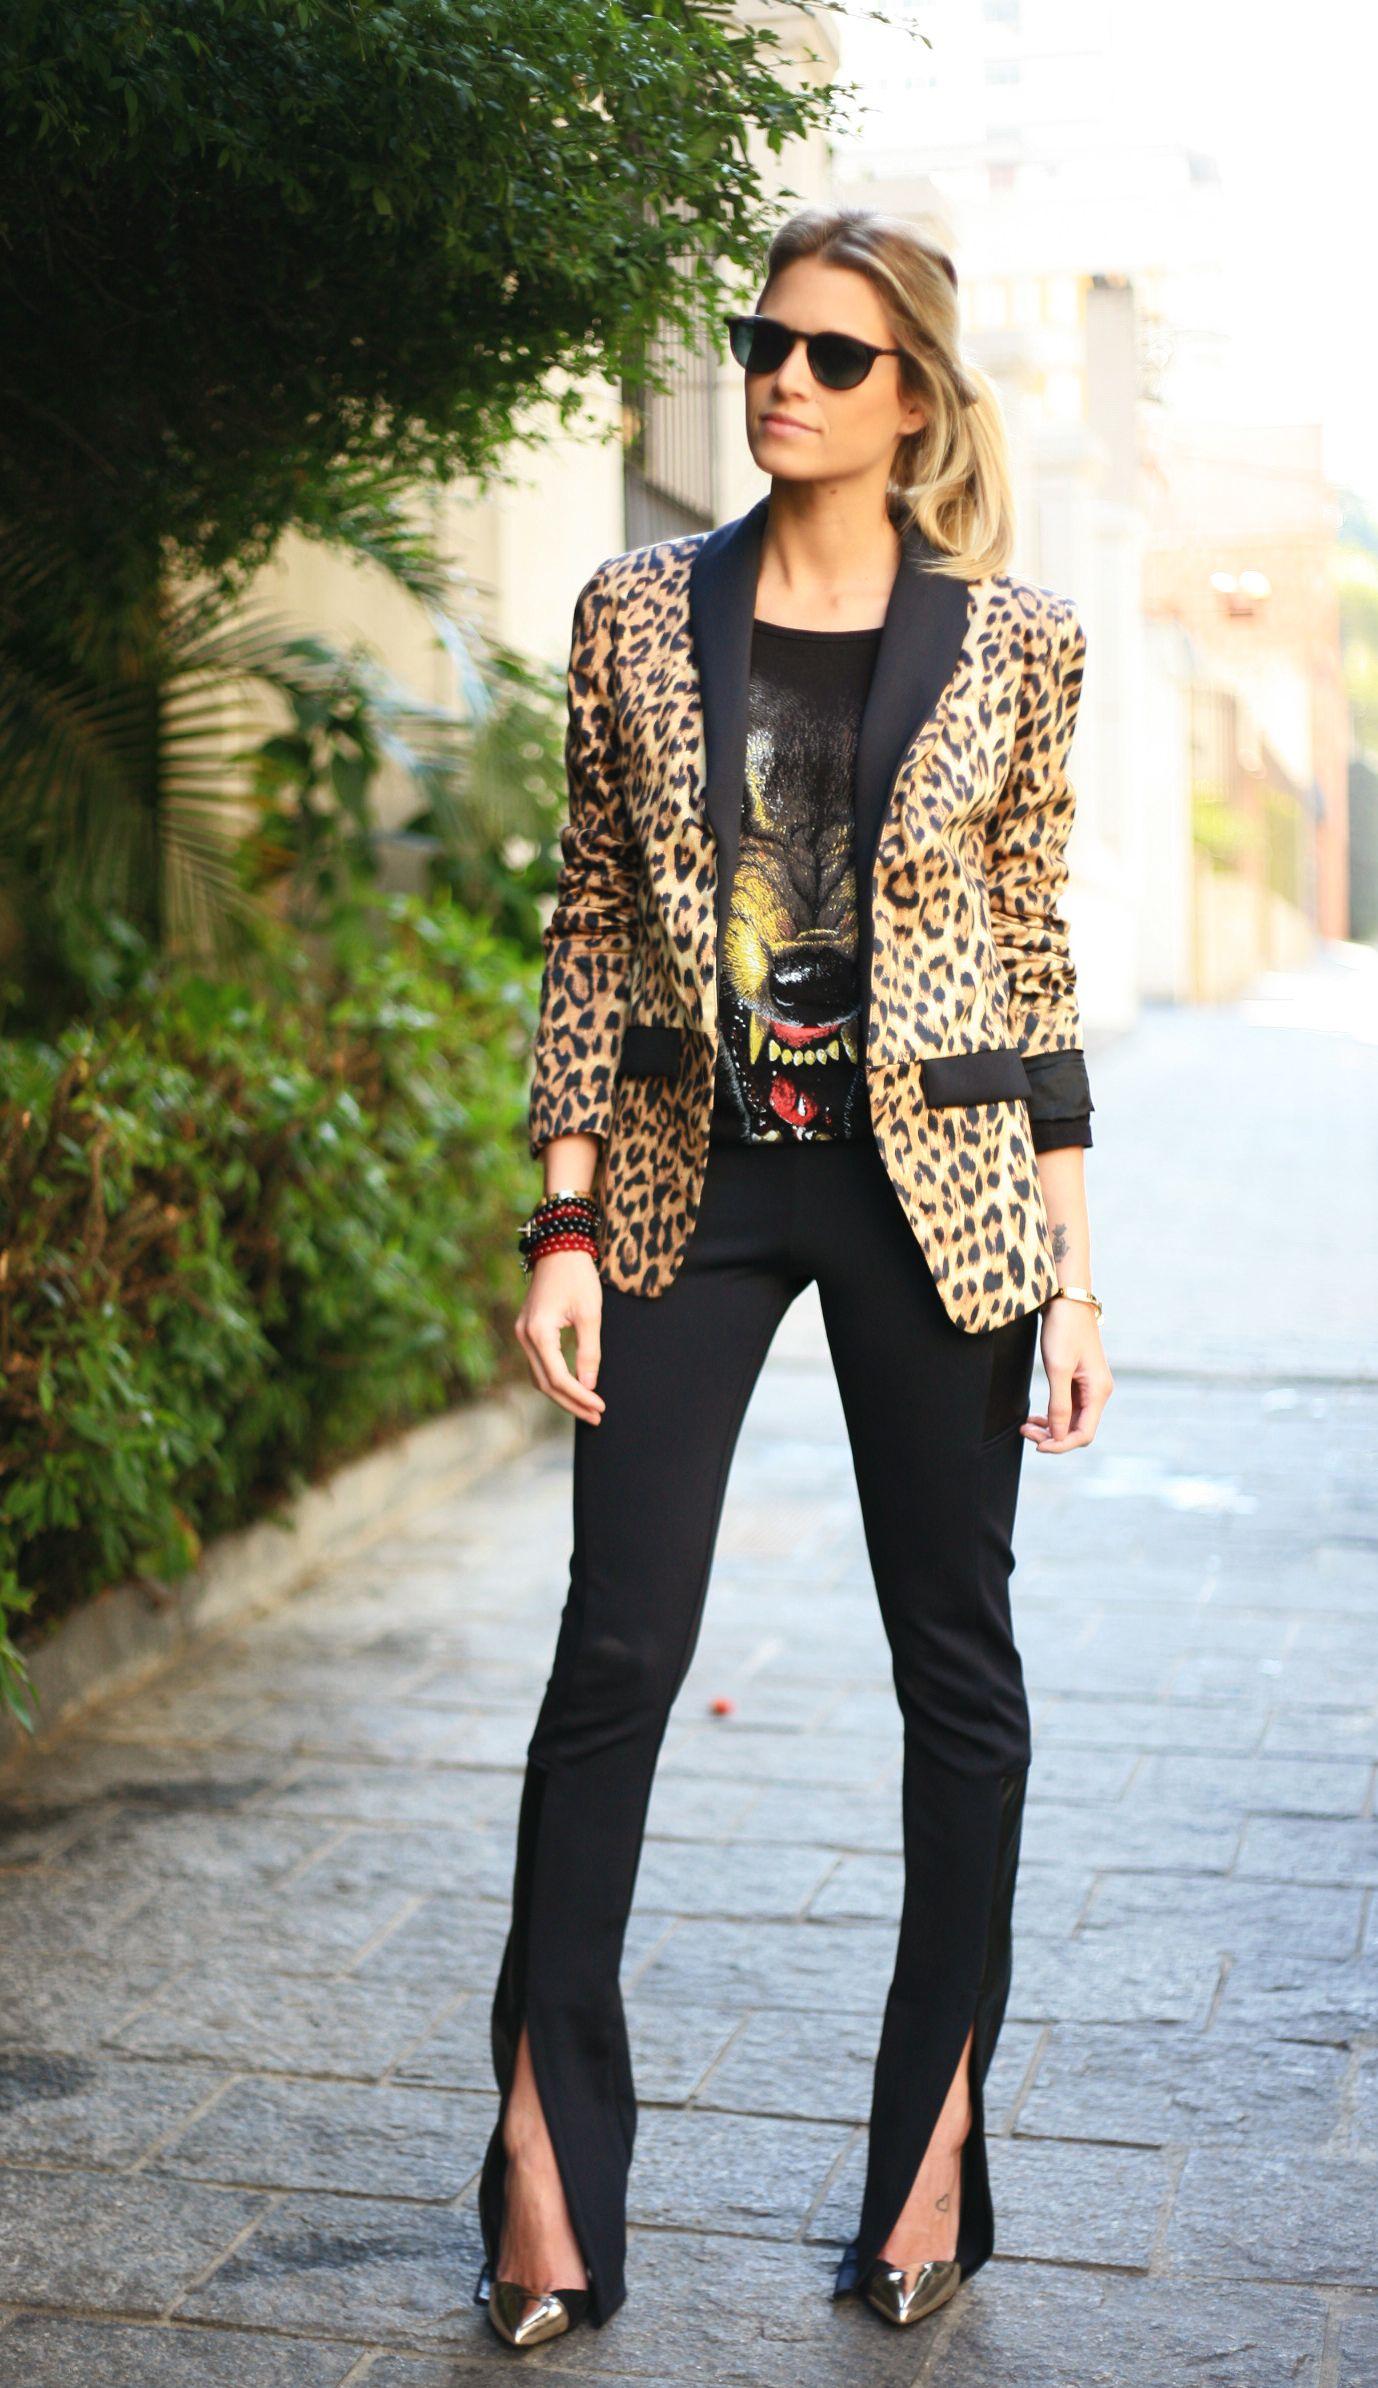 Tipsfashion Fashion challenge overalls, Stylelooks Campus on campus melissa georgetown university